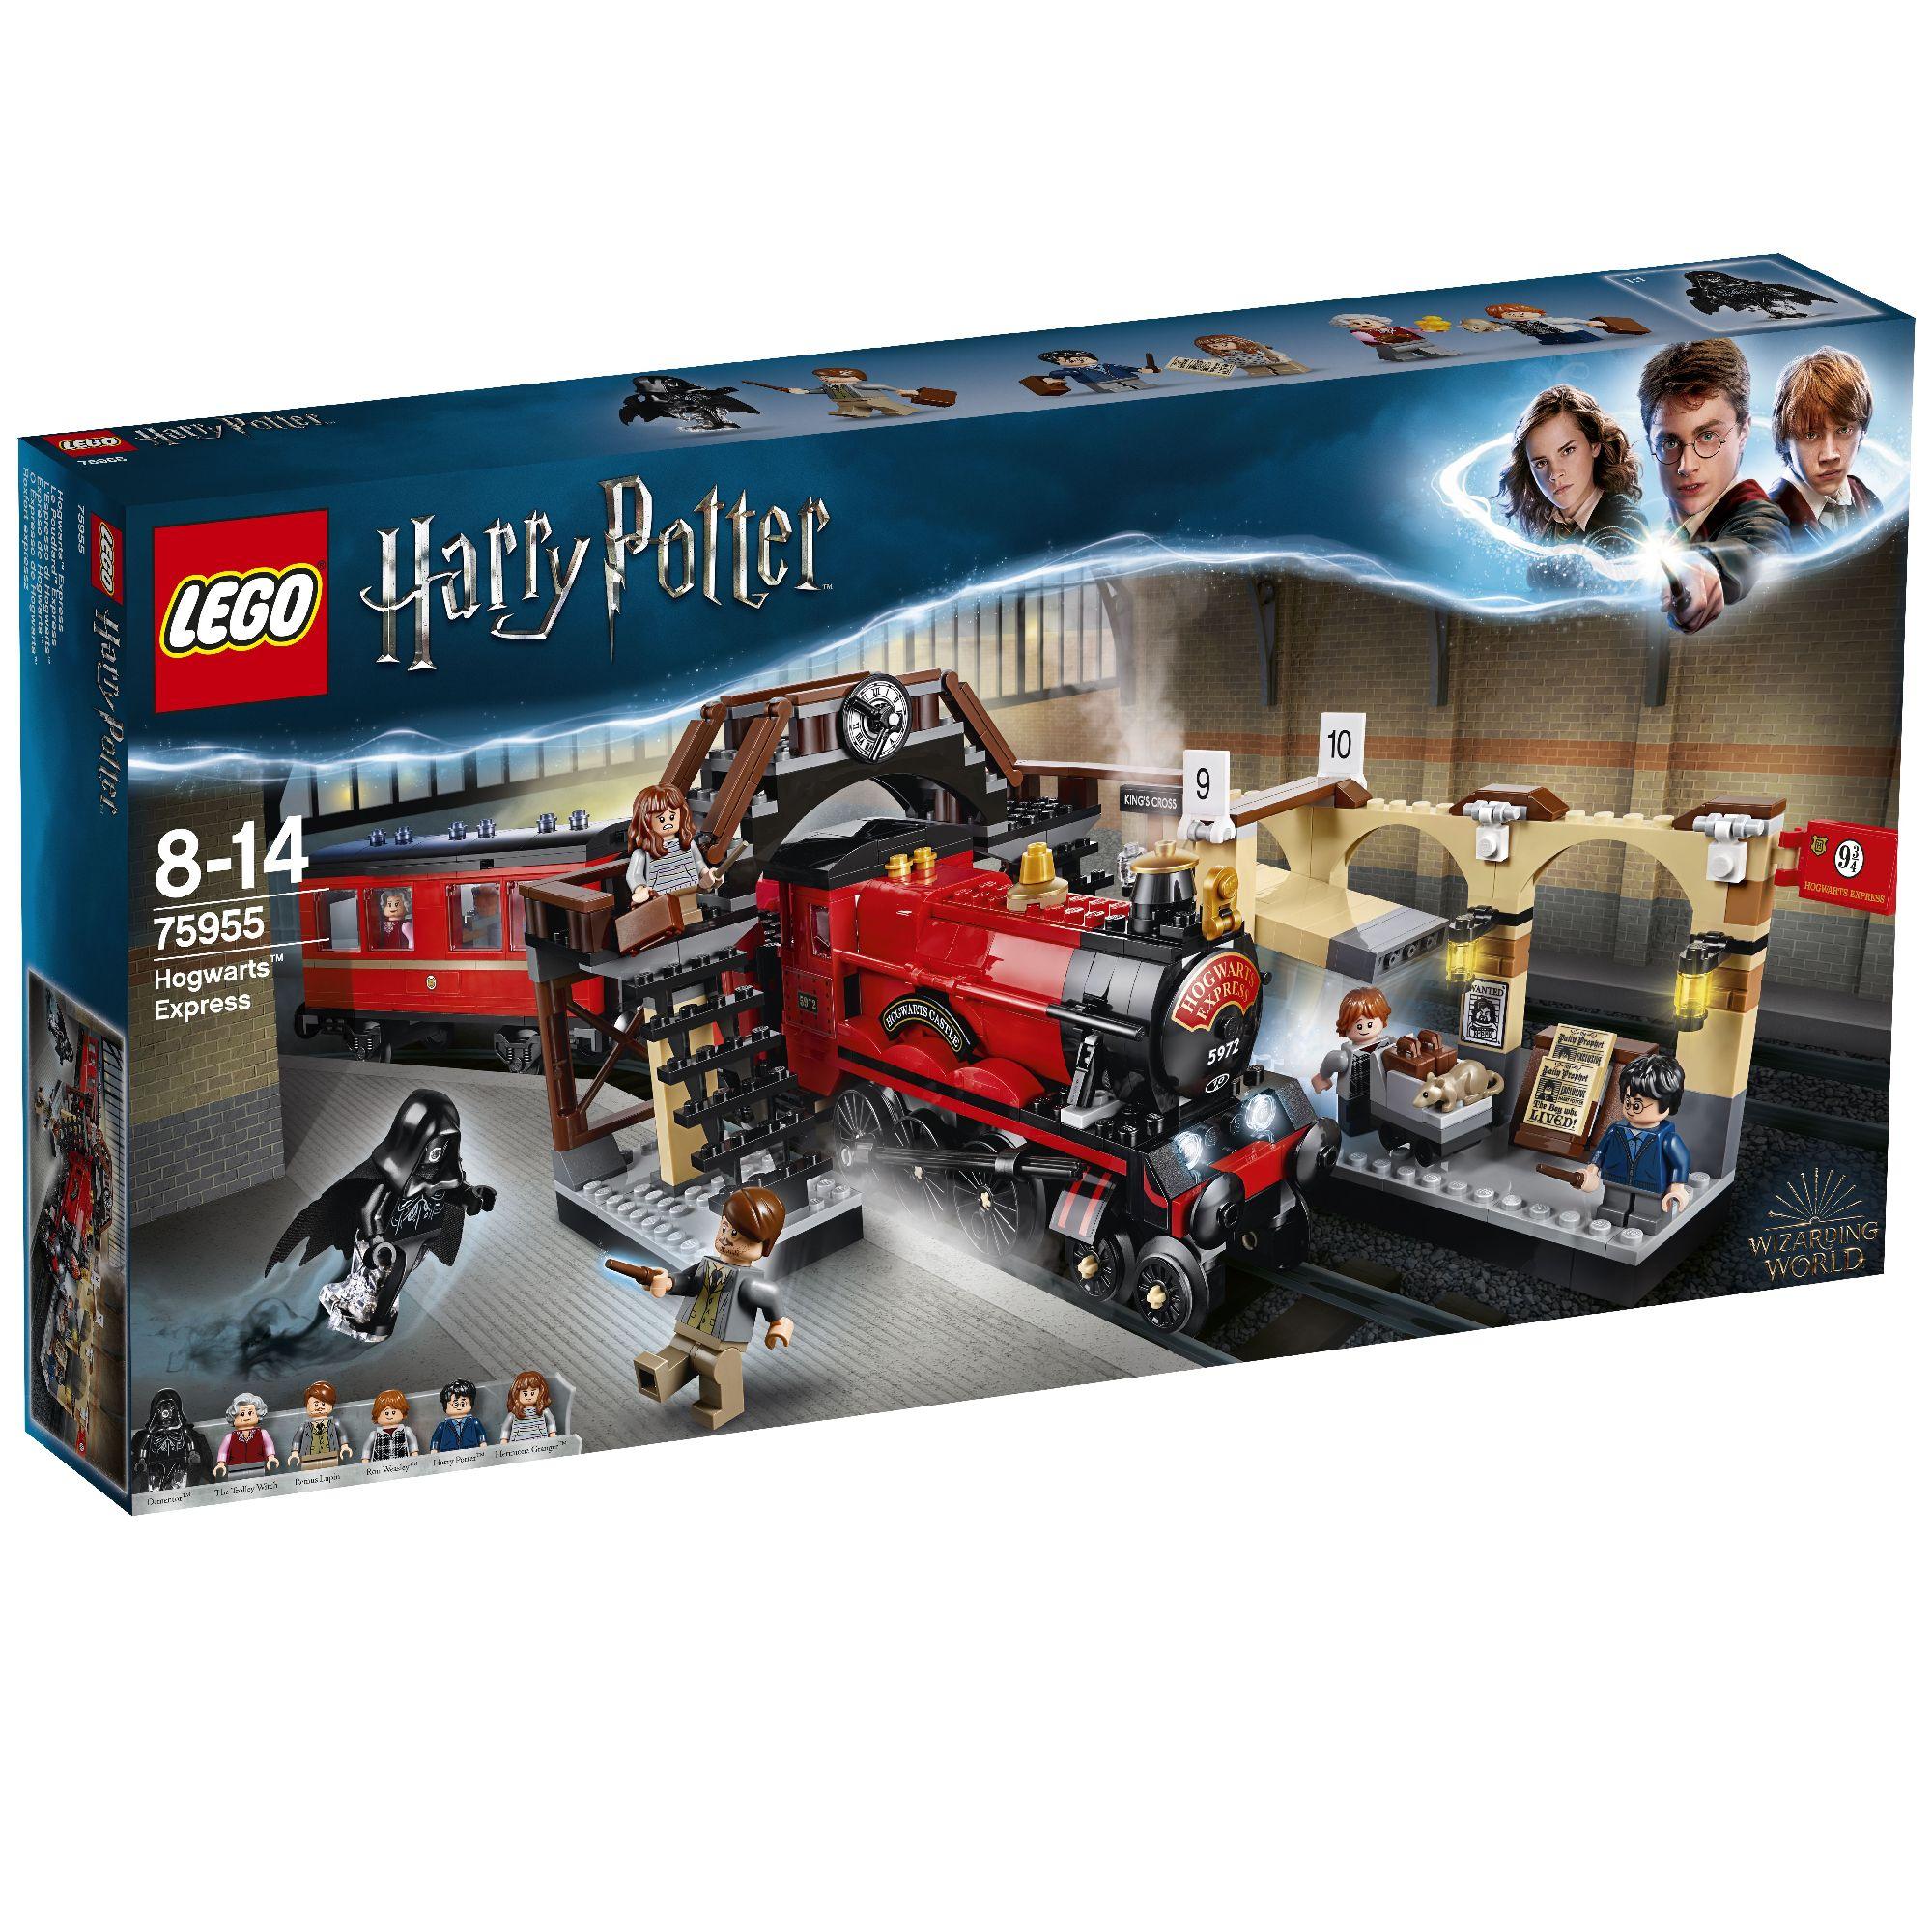 75955 - harry potter - espresso per hogwarts - warner bros. - toys center - lego-harry-potter, LEGO® Harry Potter™, WARNER BROS.